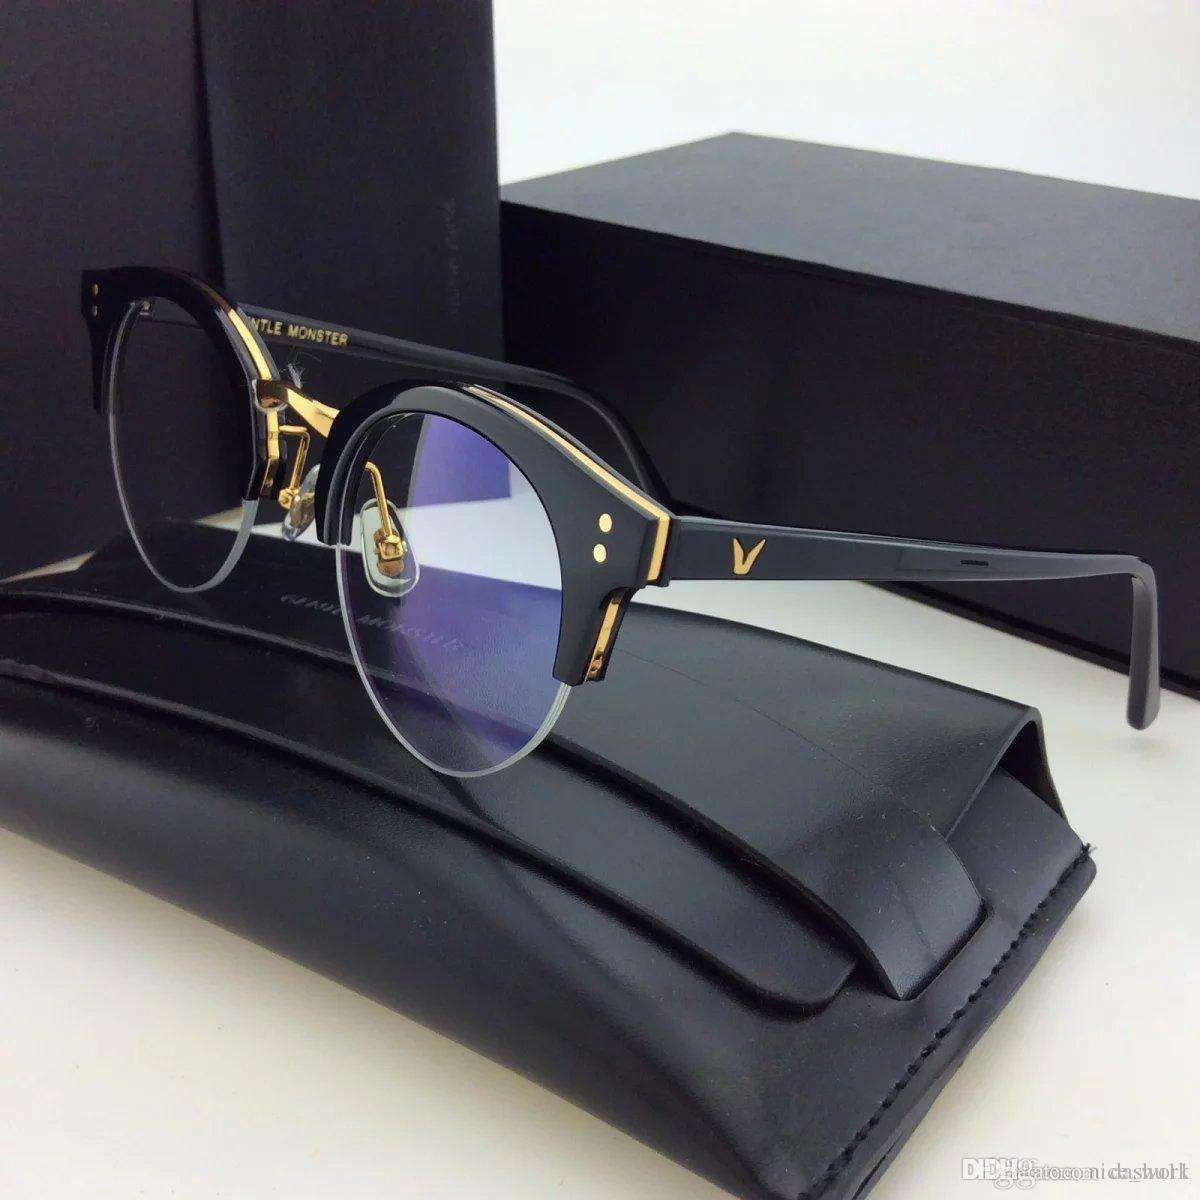 eba24f1463a 2019 Brand Glasses Gentle Pavana Metal Half Frame Glasses Frame Retro  Eyeglass Woman Men Reading Glass UV Protection Clear Lens Computer Eyewear  From ...